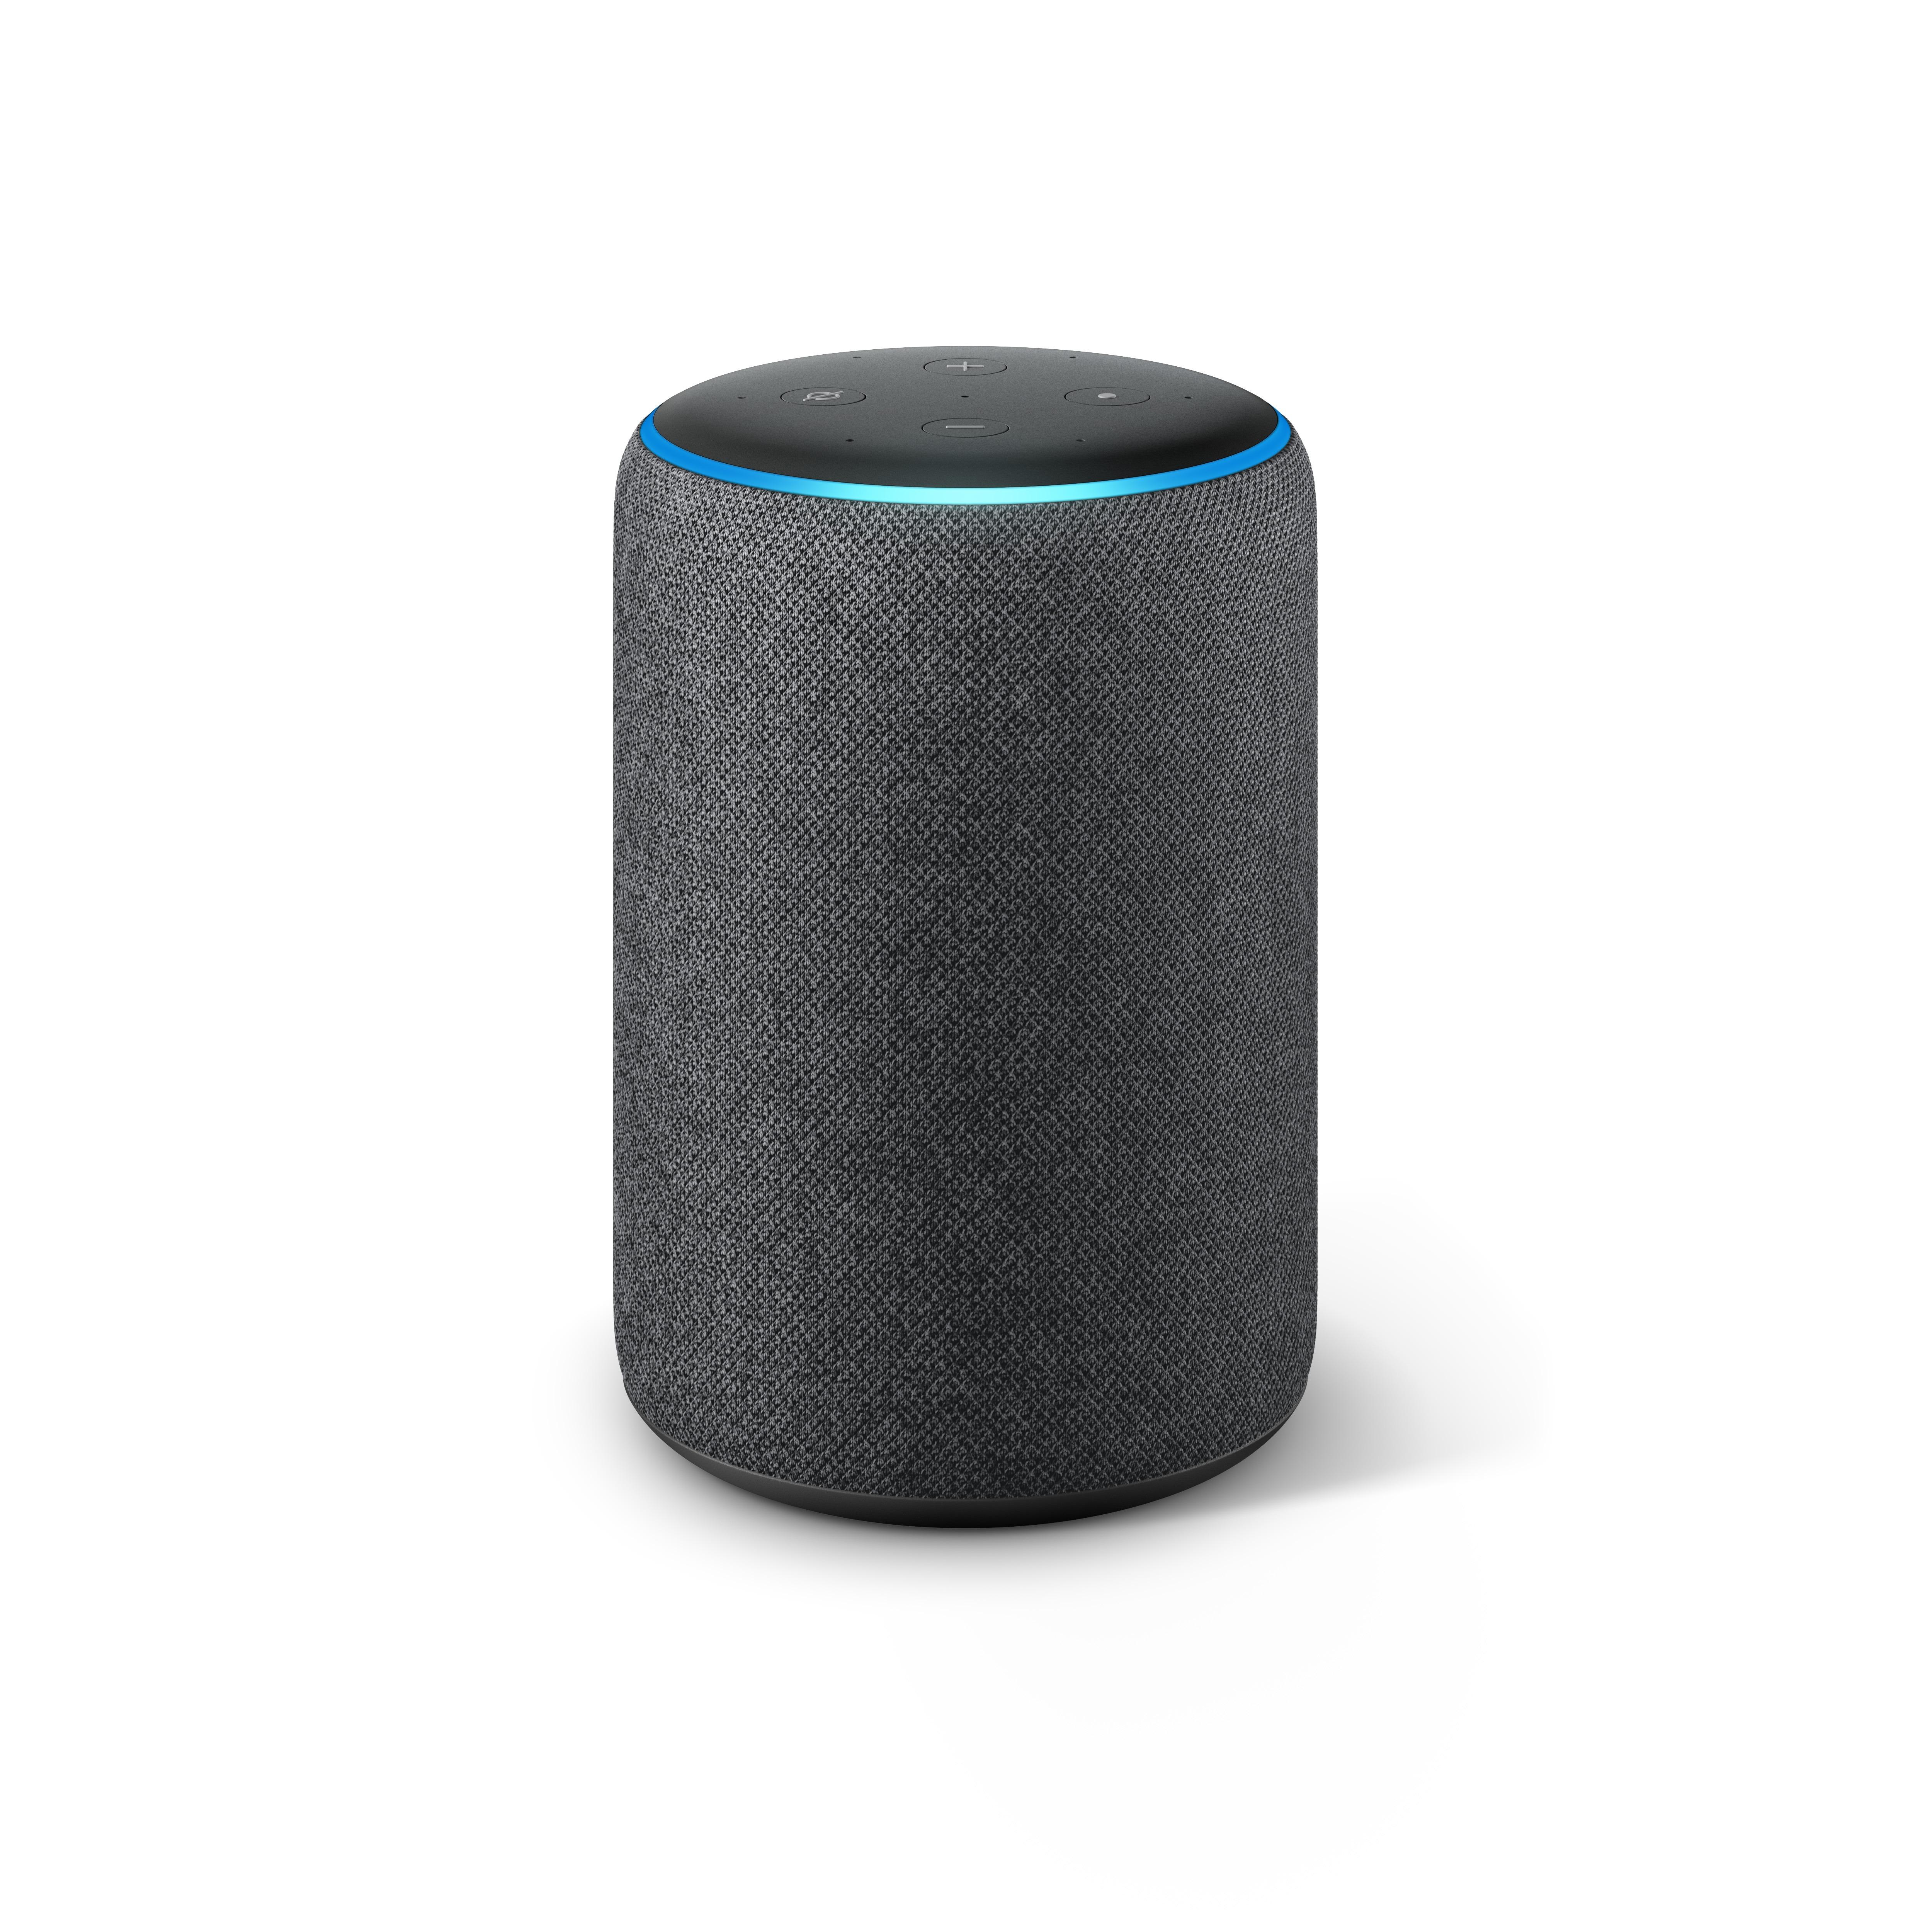 Amazon avduket en ny Echo Plus.